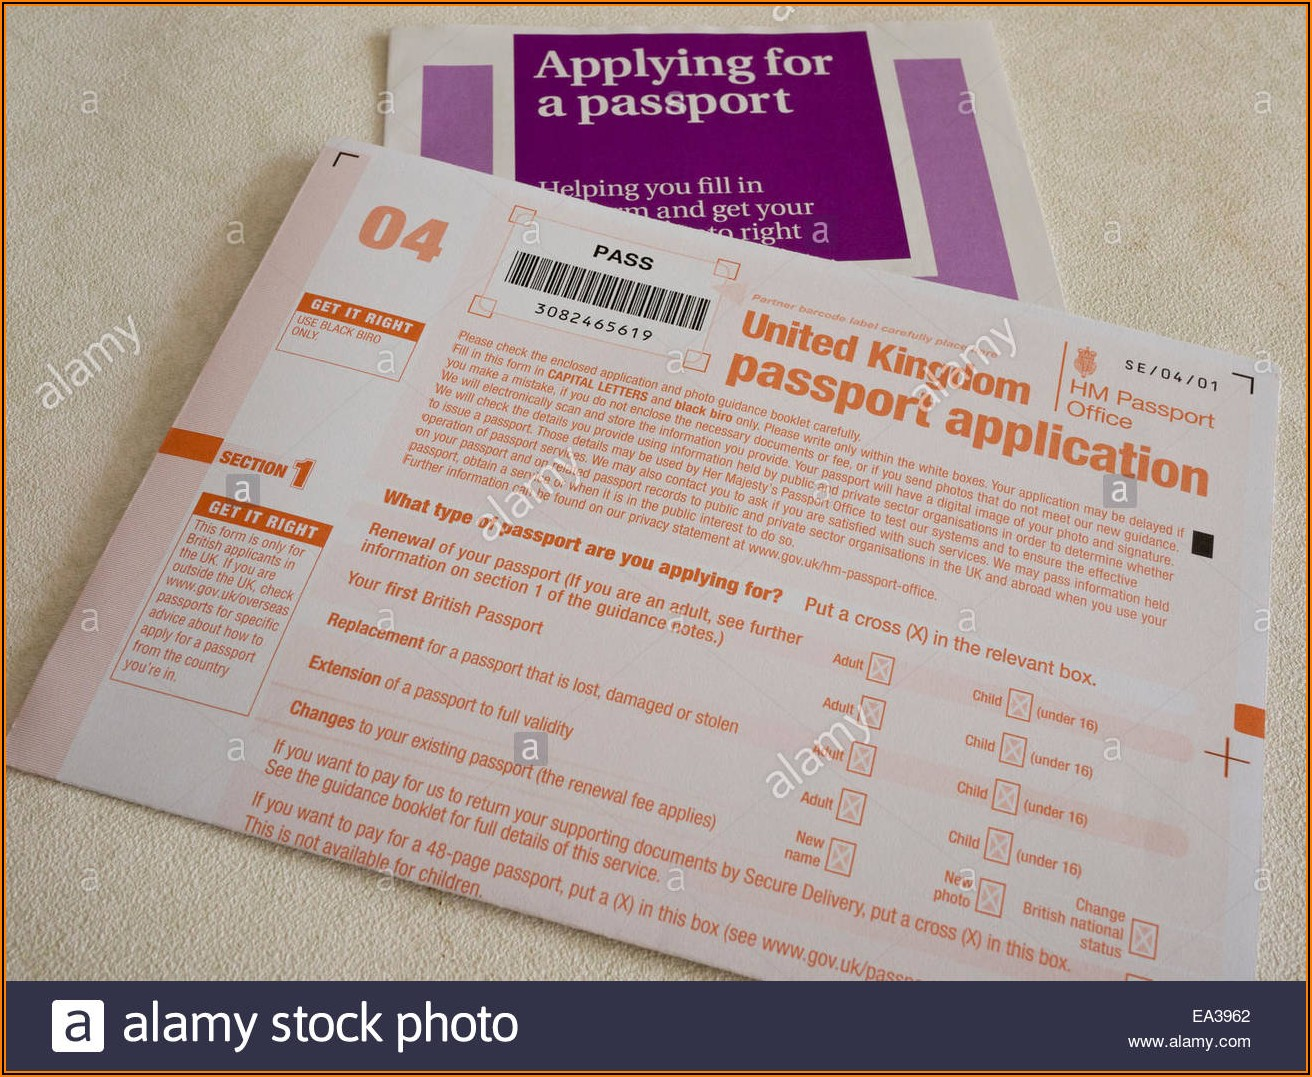 British Passport Renewal Forms Australia